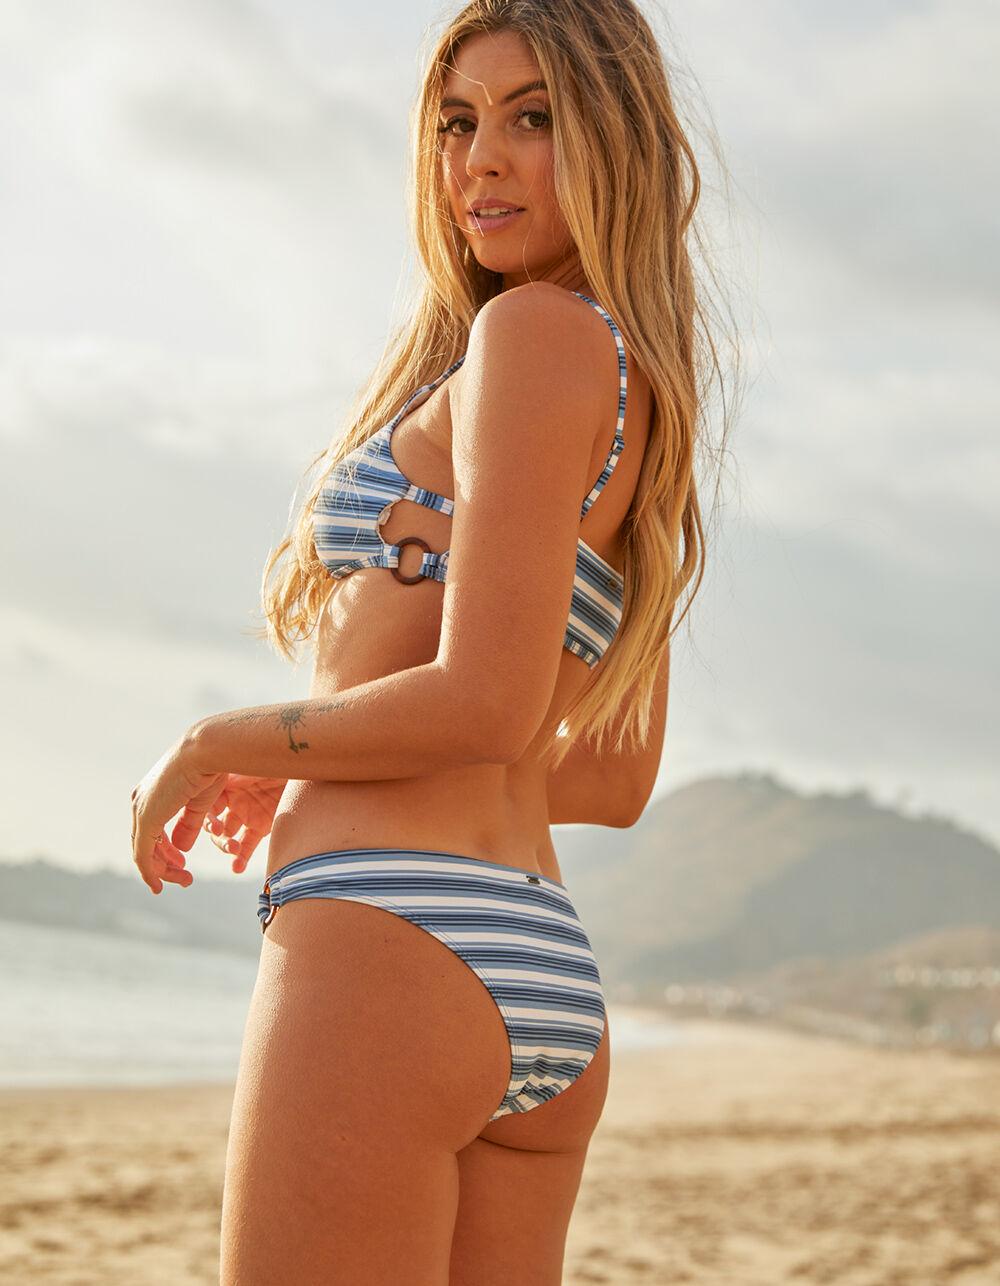 O'NEILL Ring Bikini Bottom